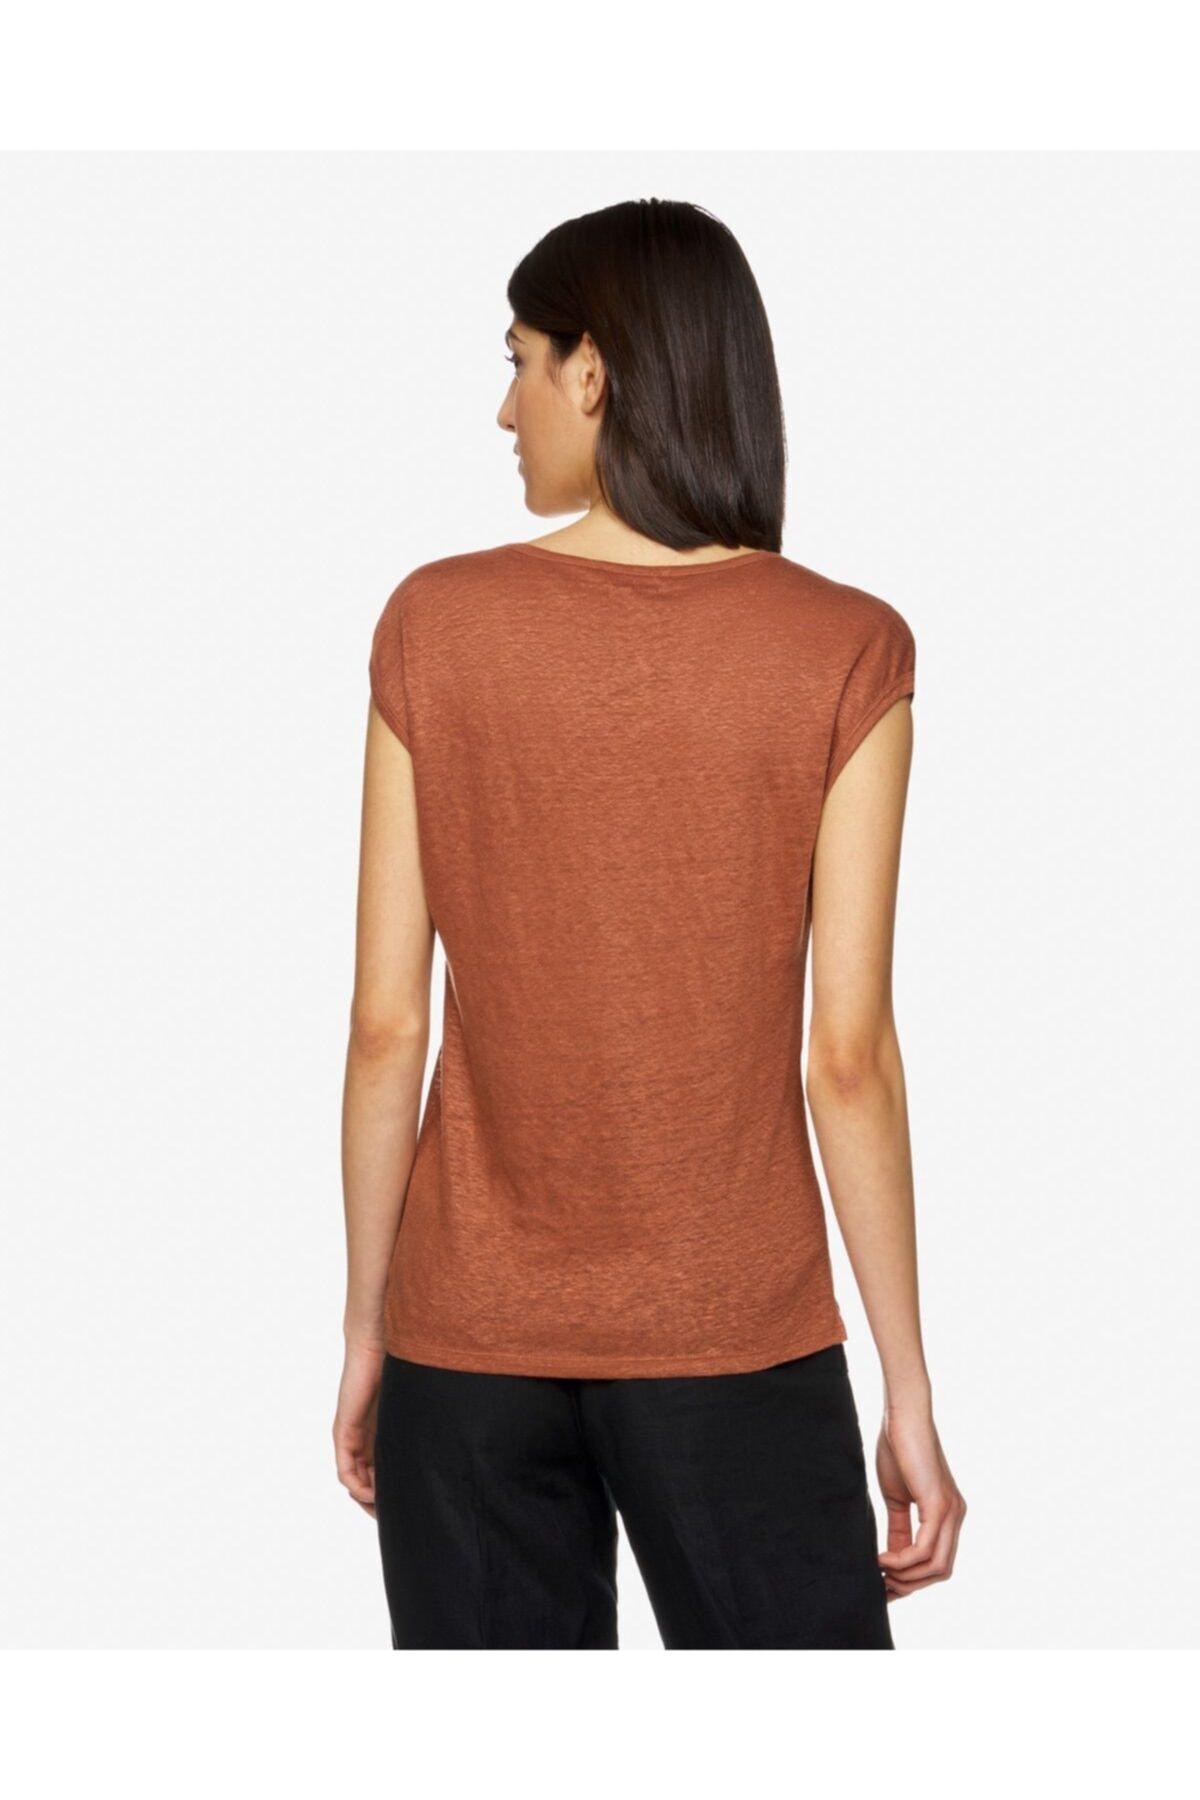 United Colors of Benetton Kadın Kahverengi Basic Keten T-shirt 2